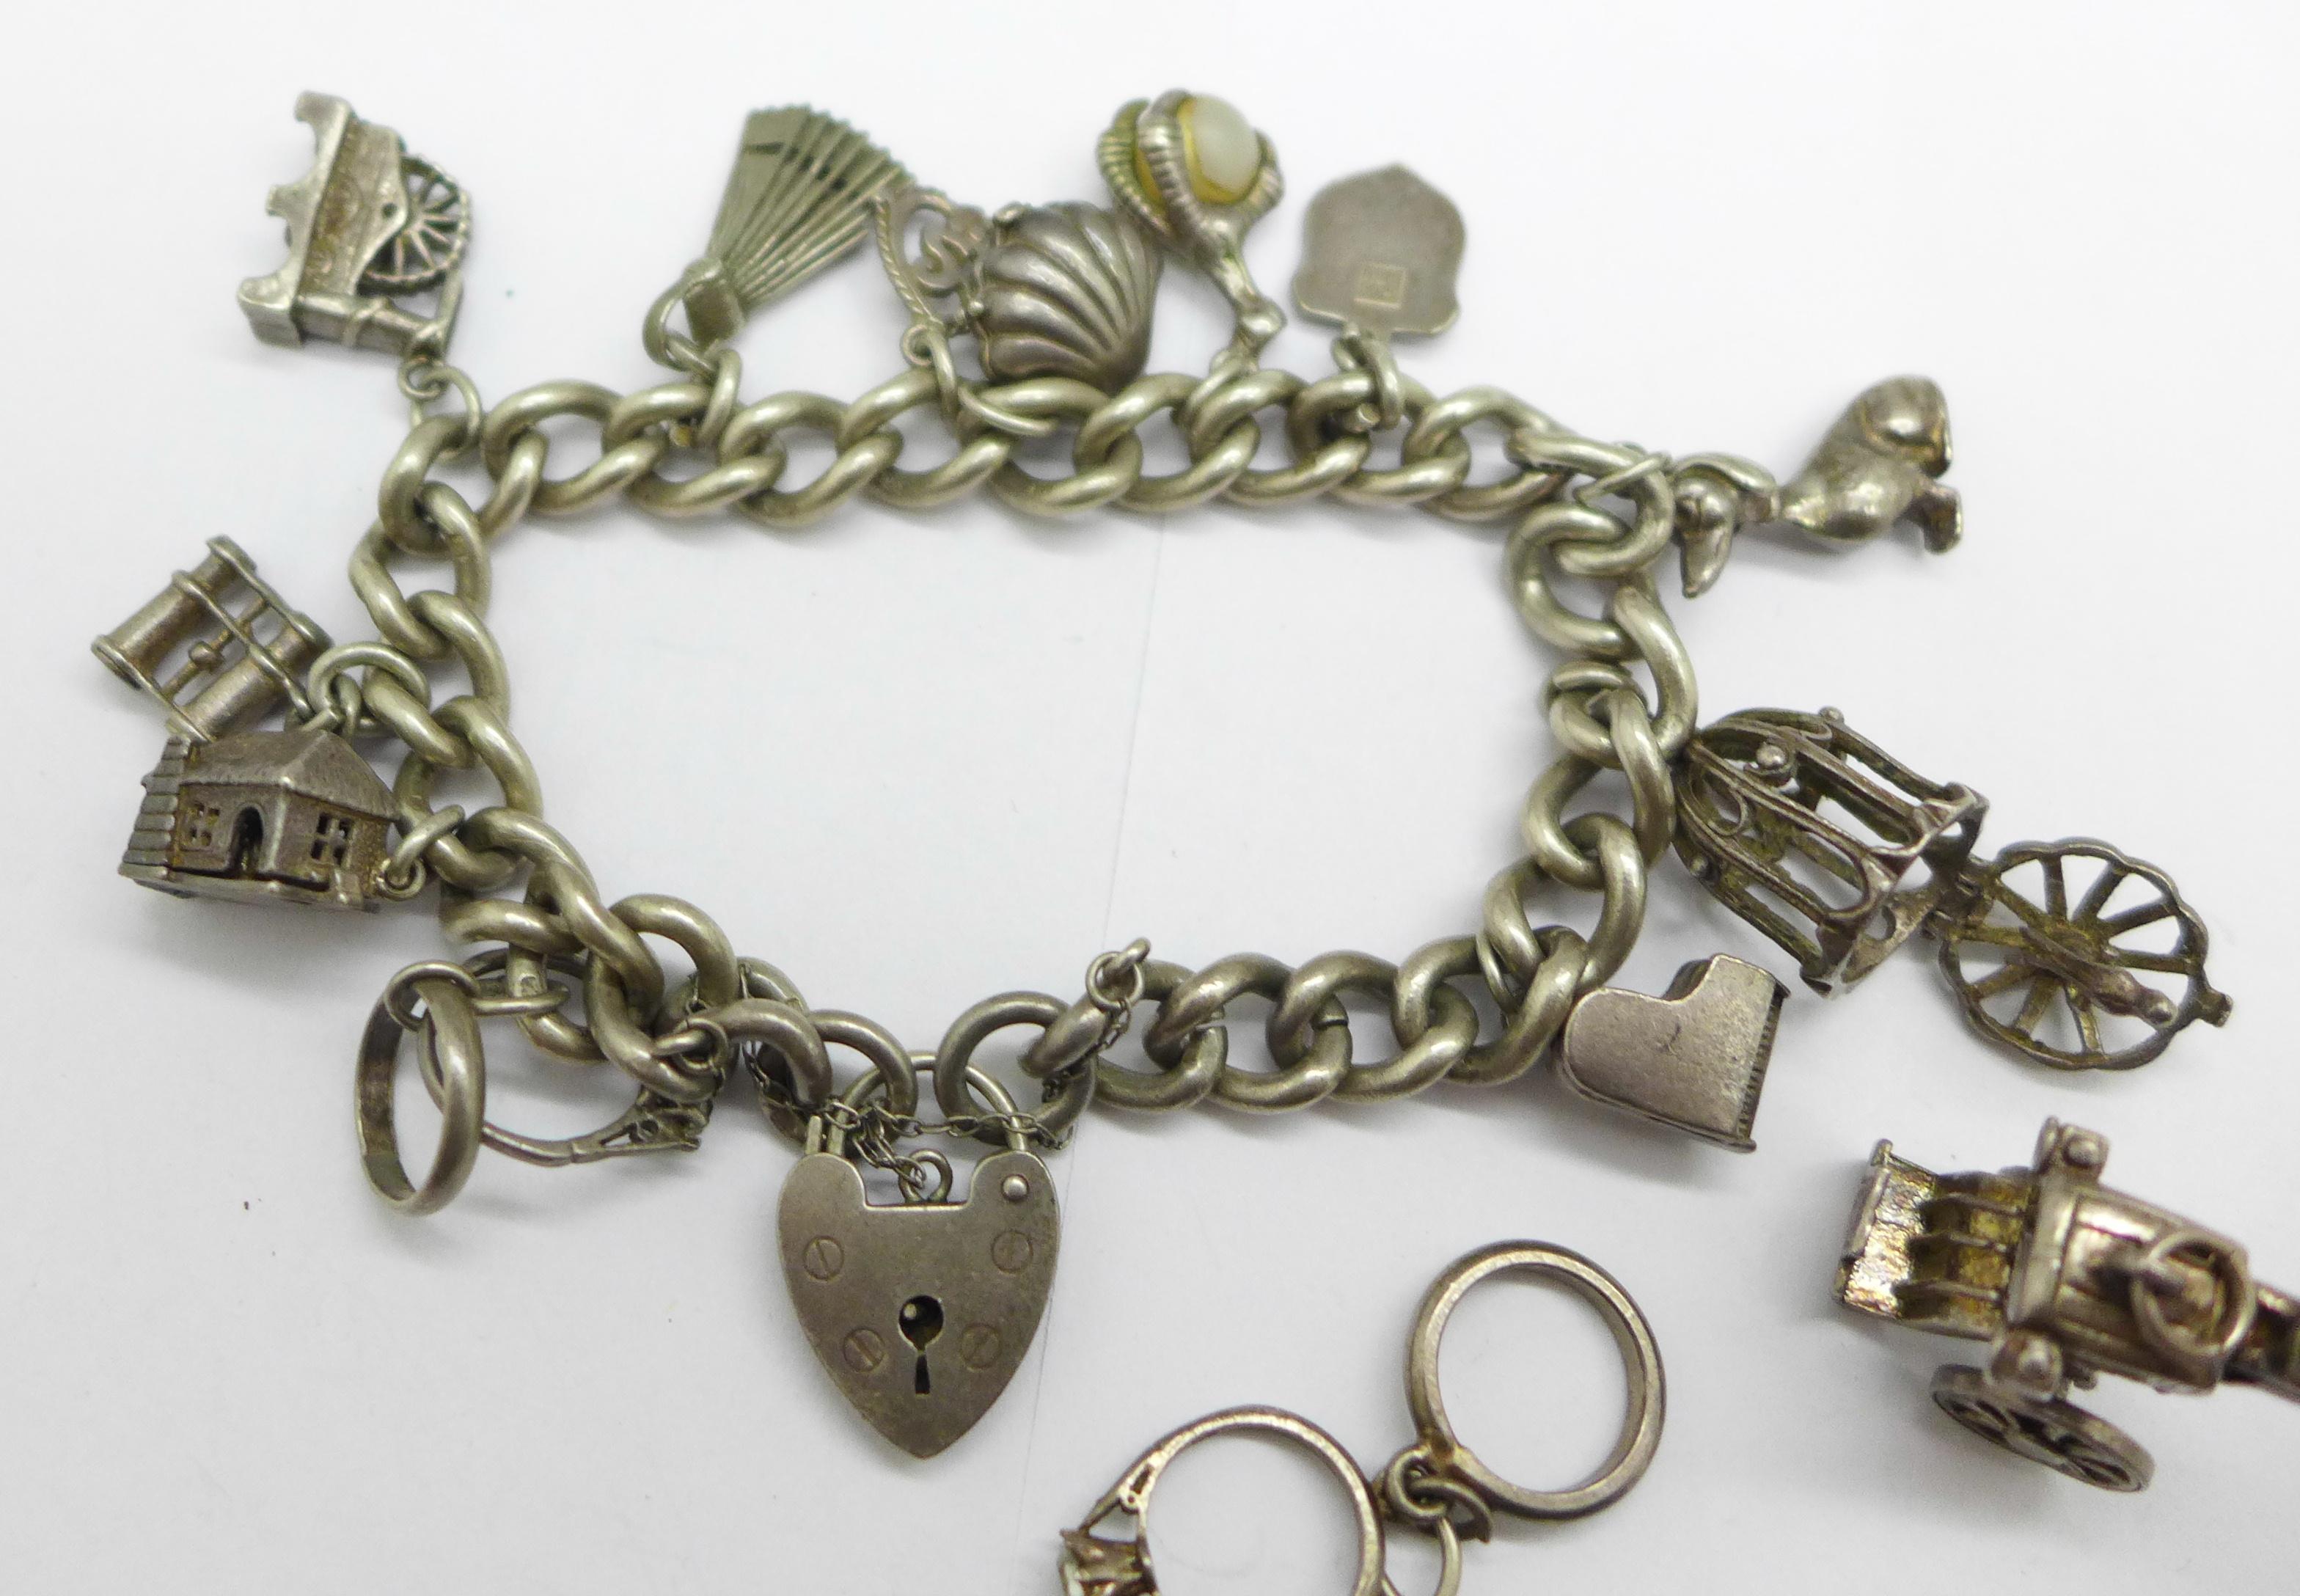 A silver charm bracelet, 68g - Image 2 of 2